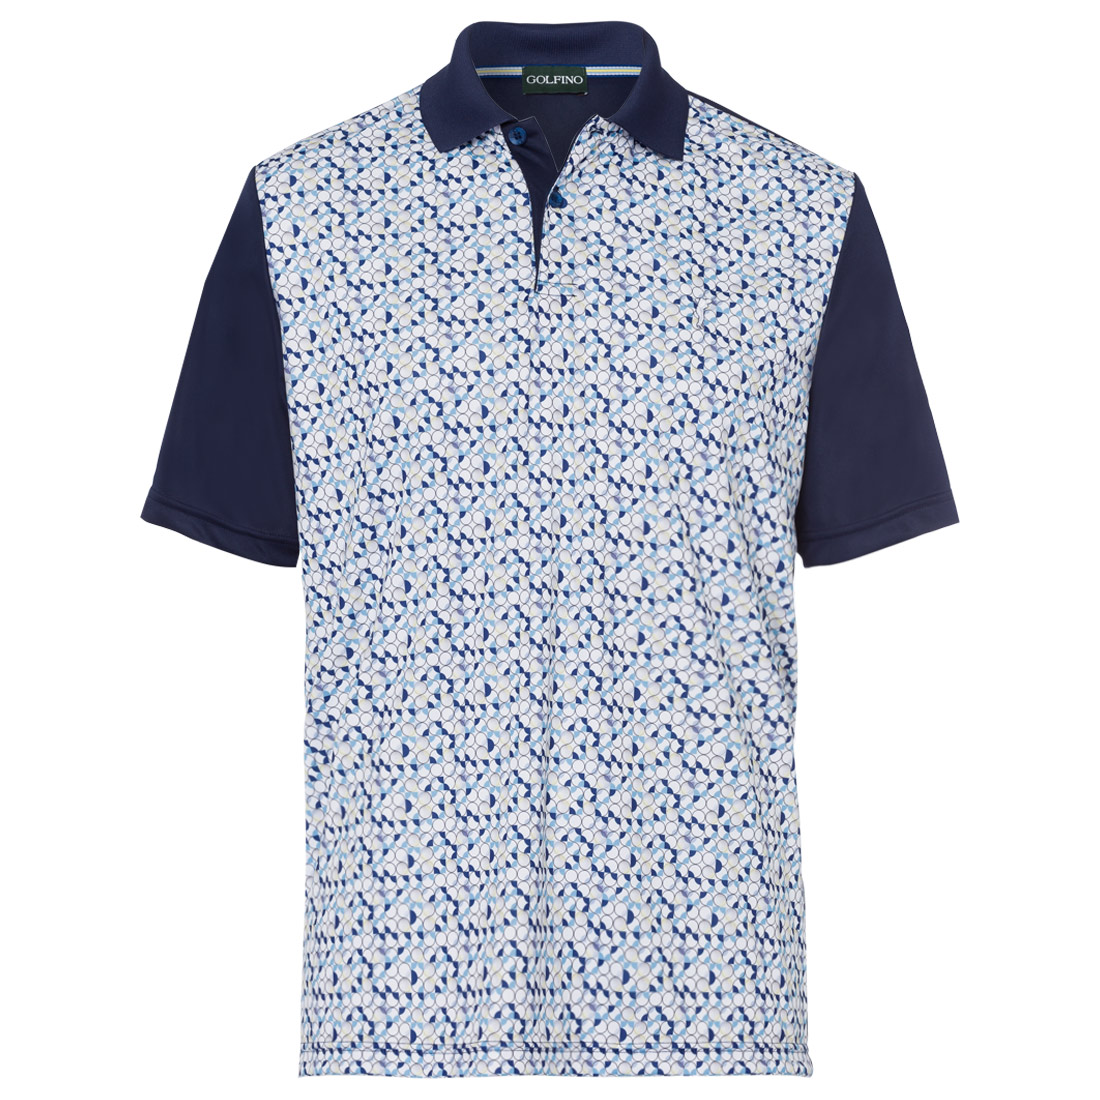 Herren Polo mit Musterpartie